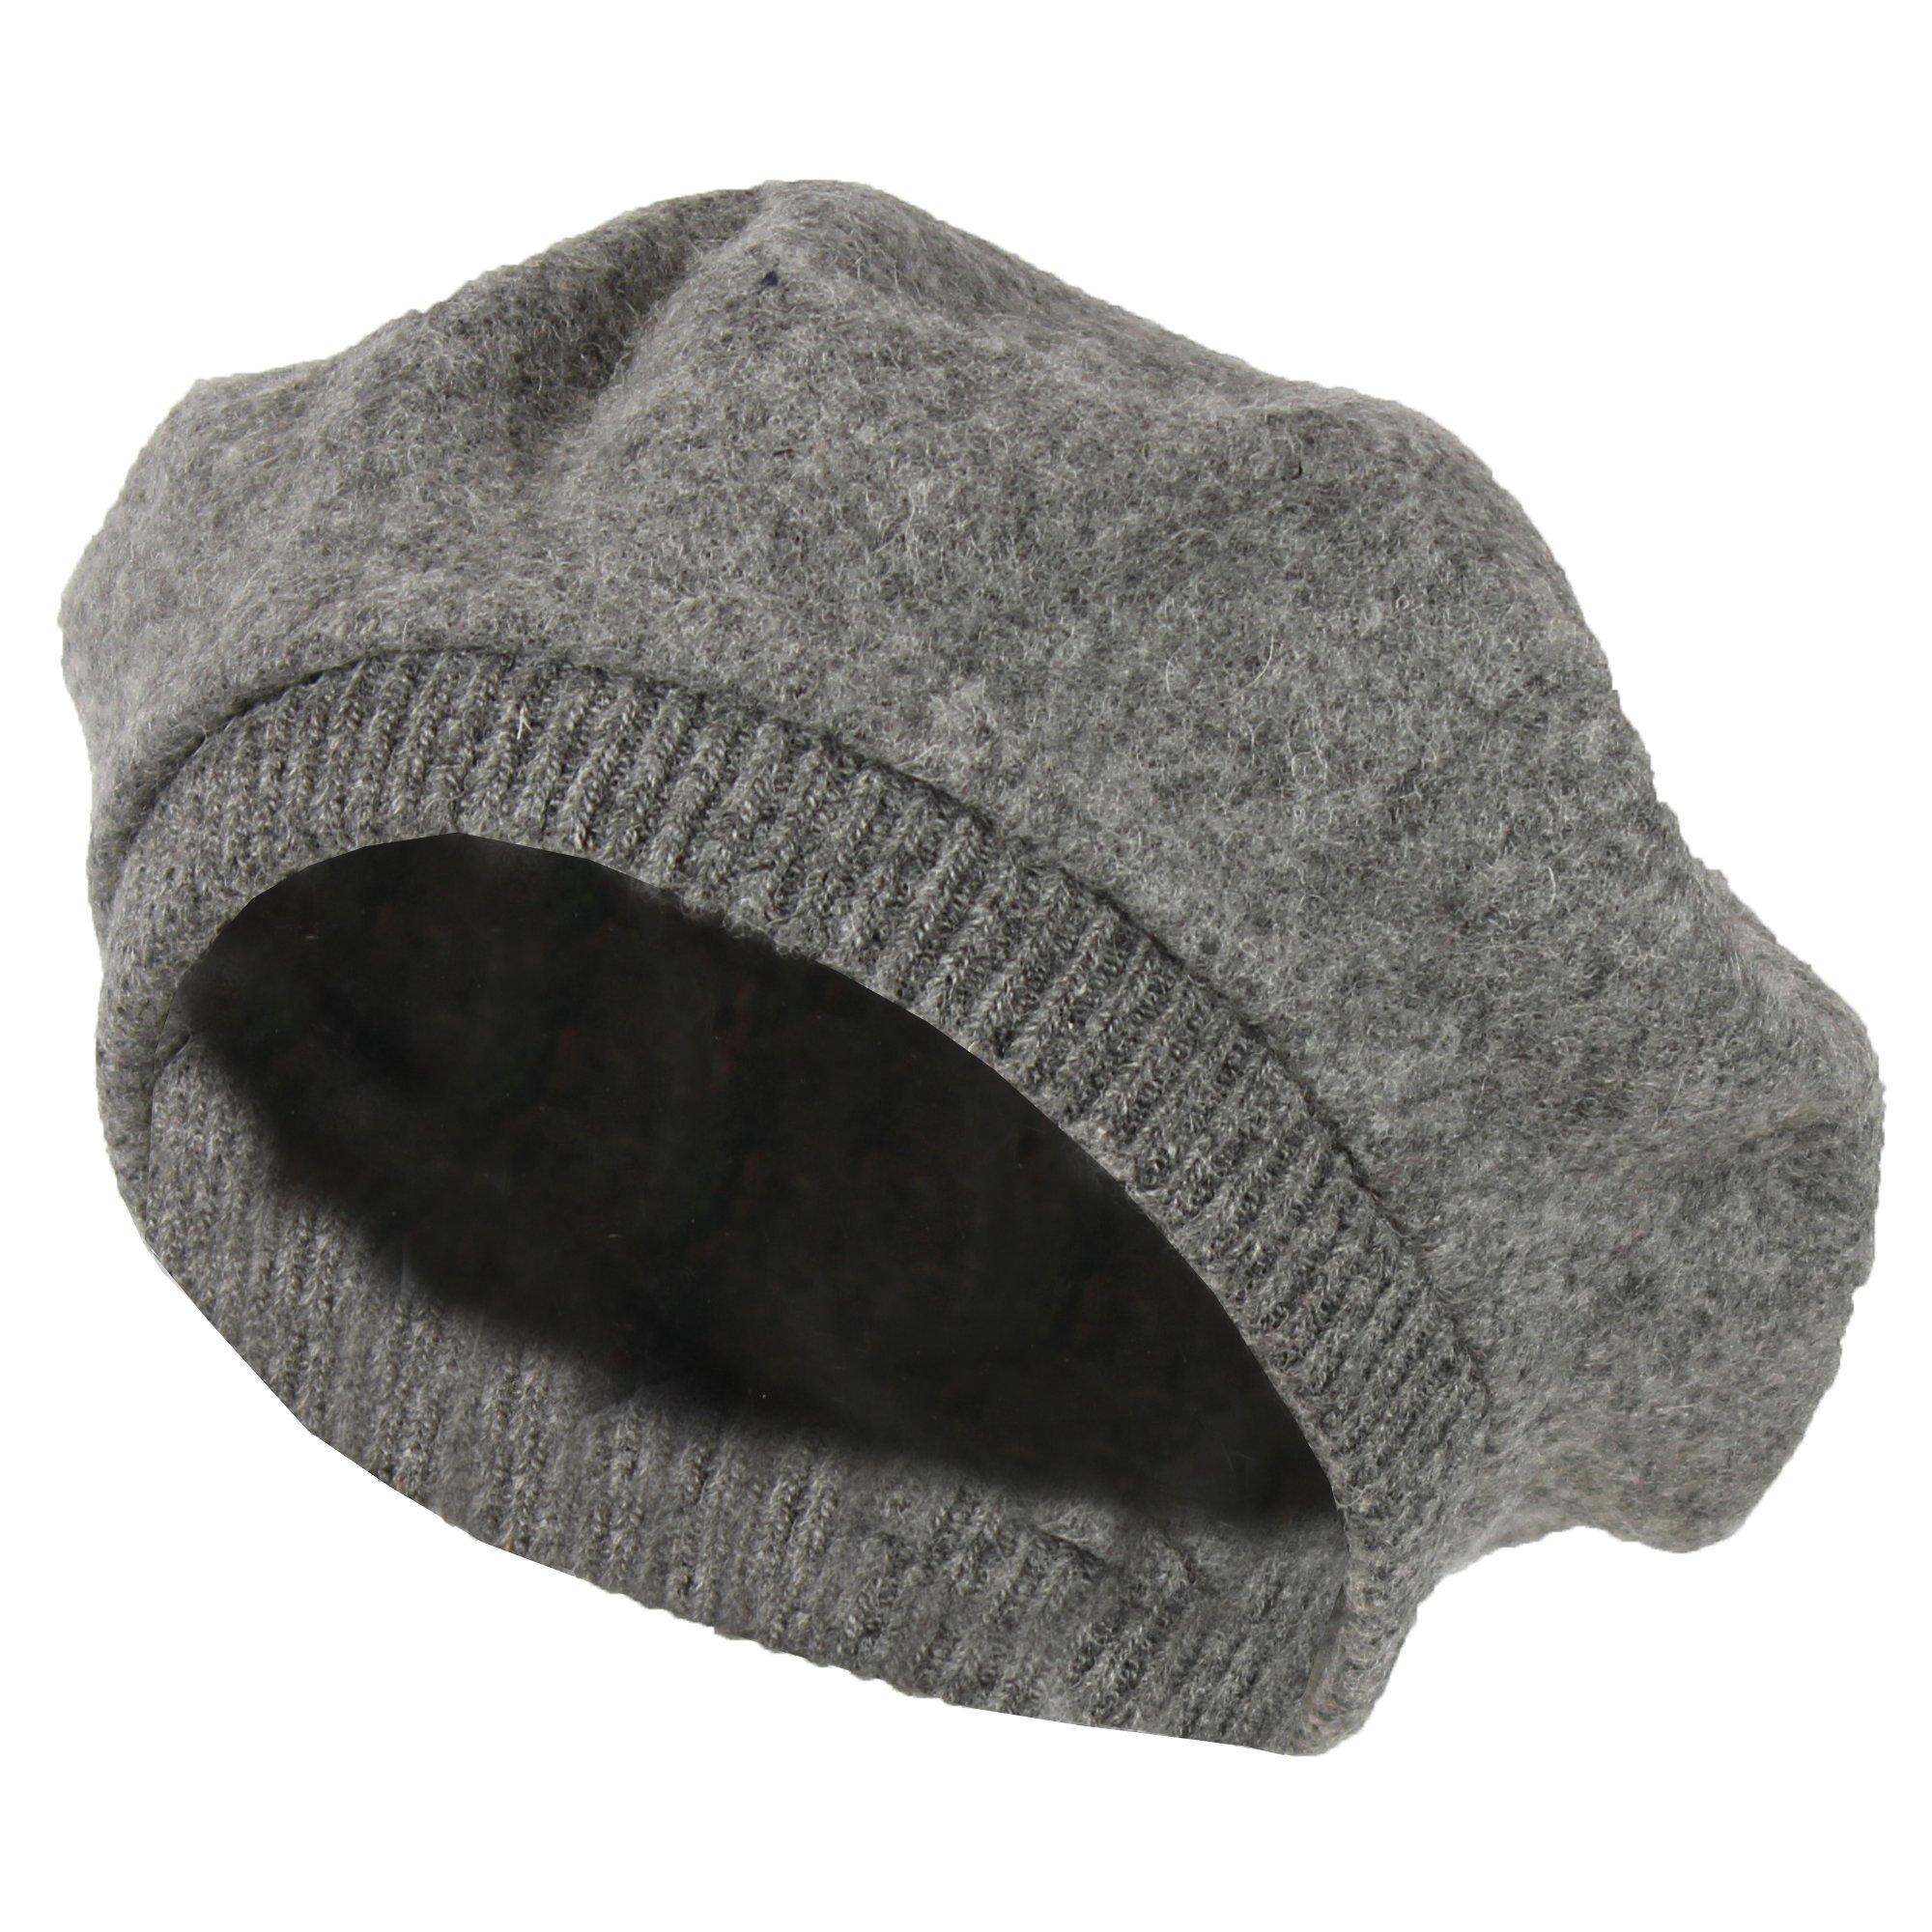 Grey 100% Wool French Beret Hat w/ Knit Cuff – Slouchy Winter Beanie Cap